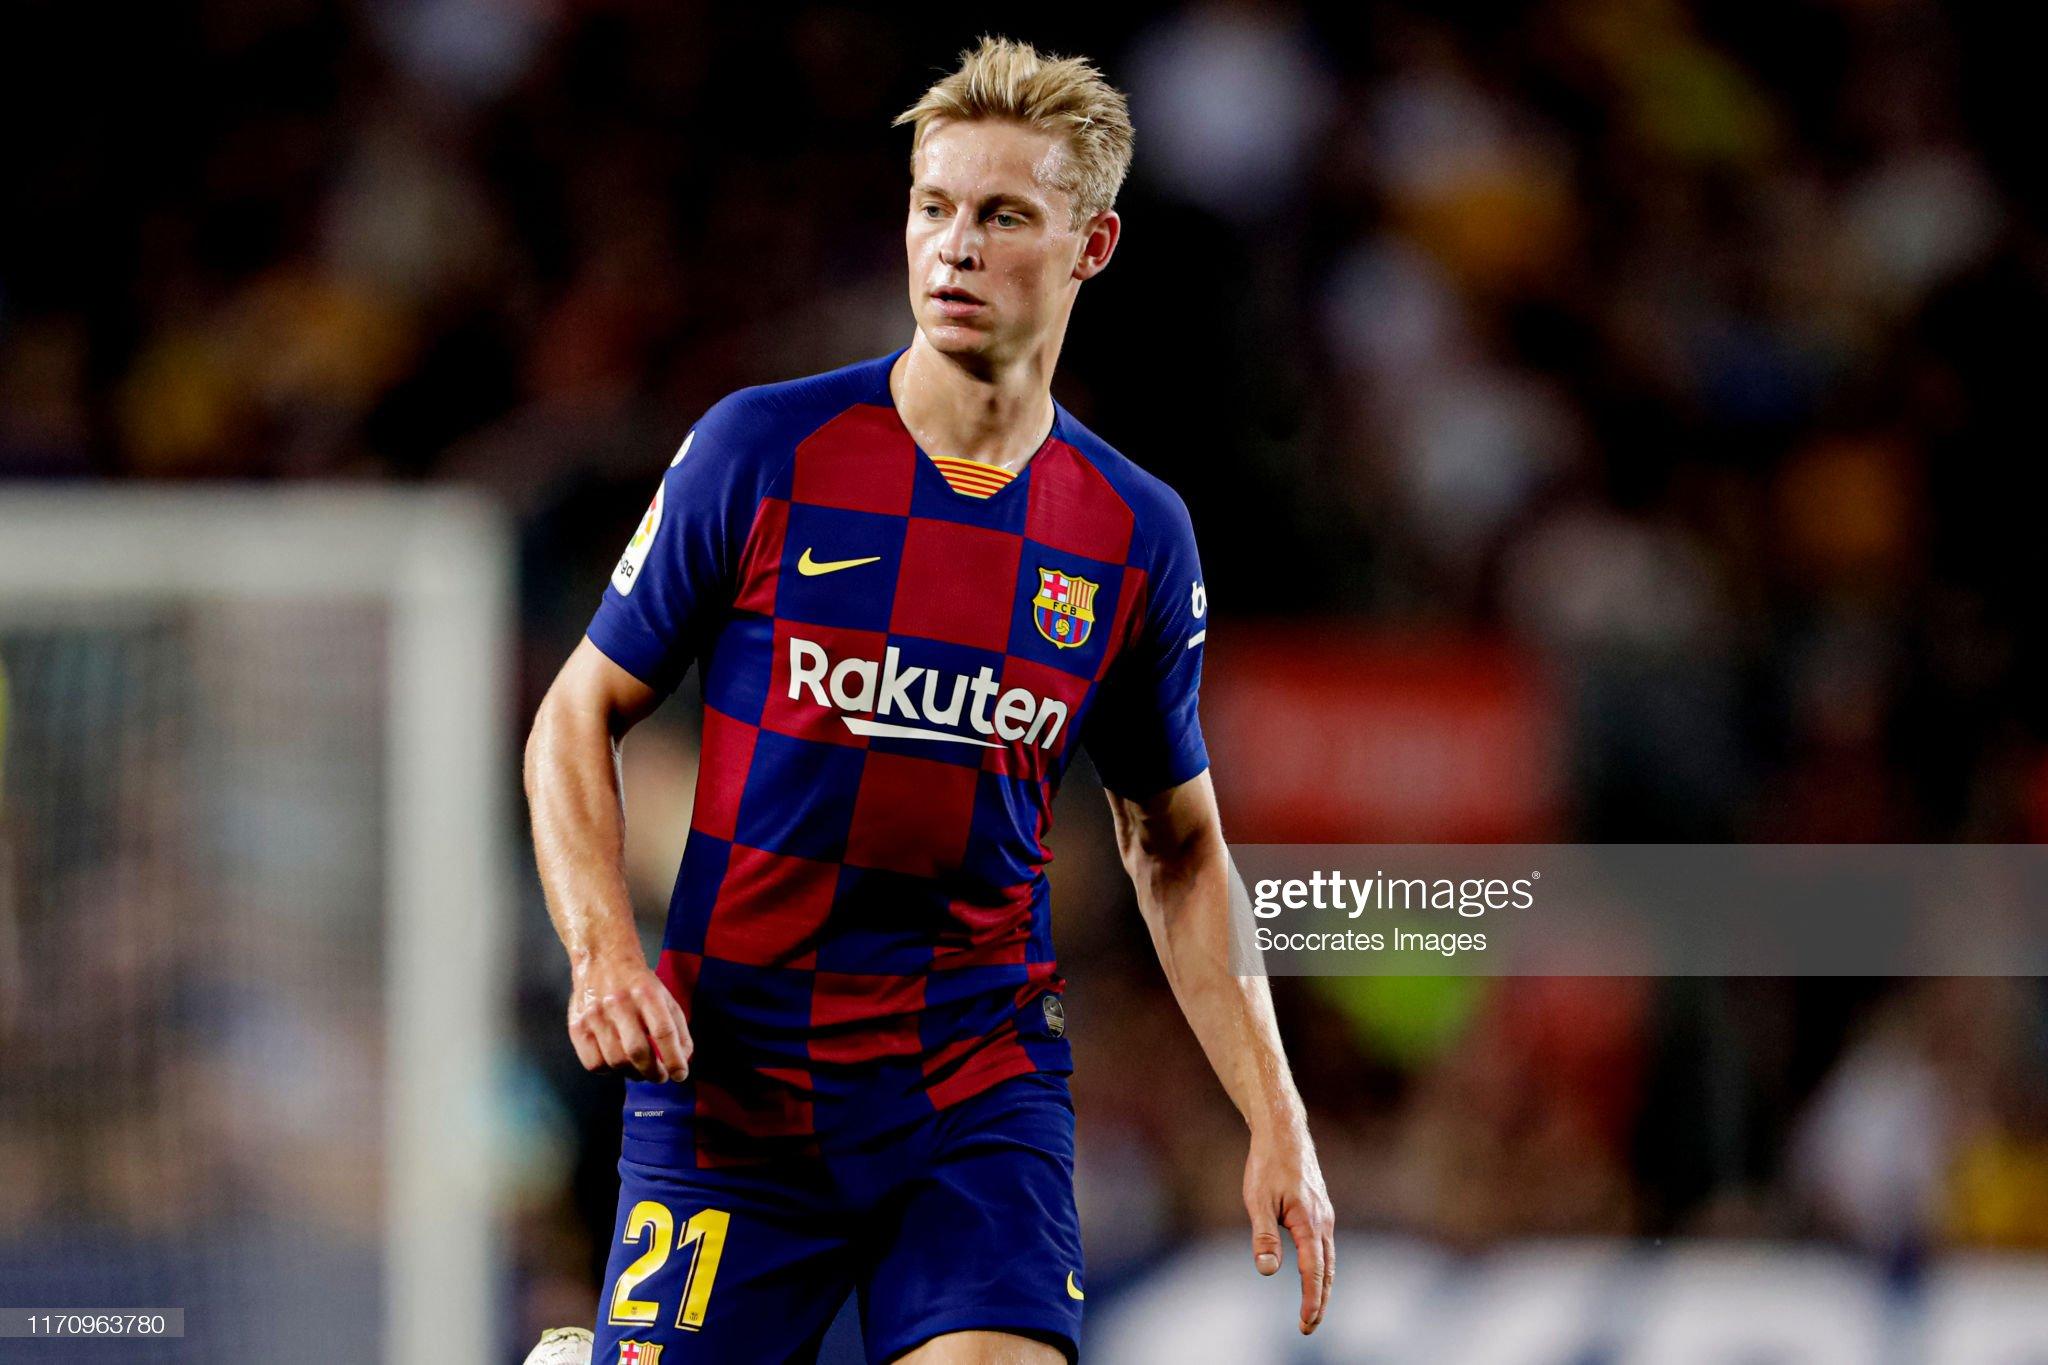 صور مباراة : برشلونة - فياريال 2-1 ( 24-09-2019 )  Frenkie-de-jong-of-fc-barcelona-during-the-la-liga-santander-match-picture-id1170963780?s=2048x2048